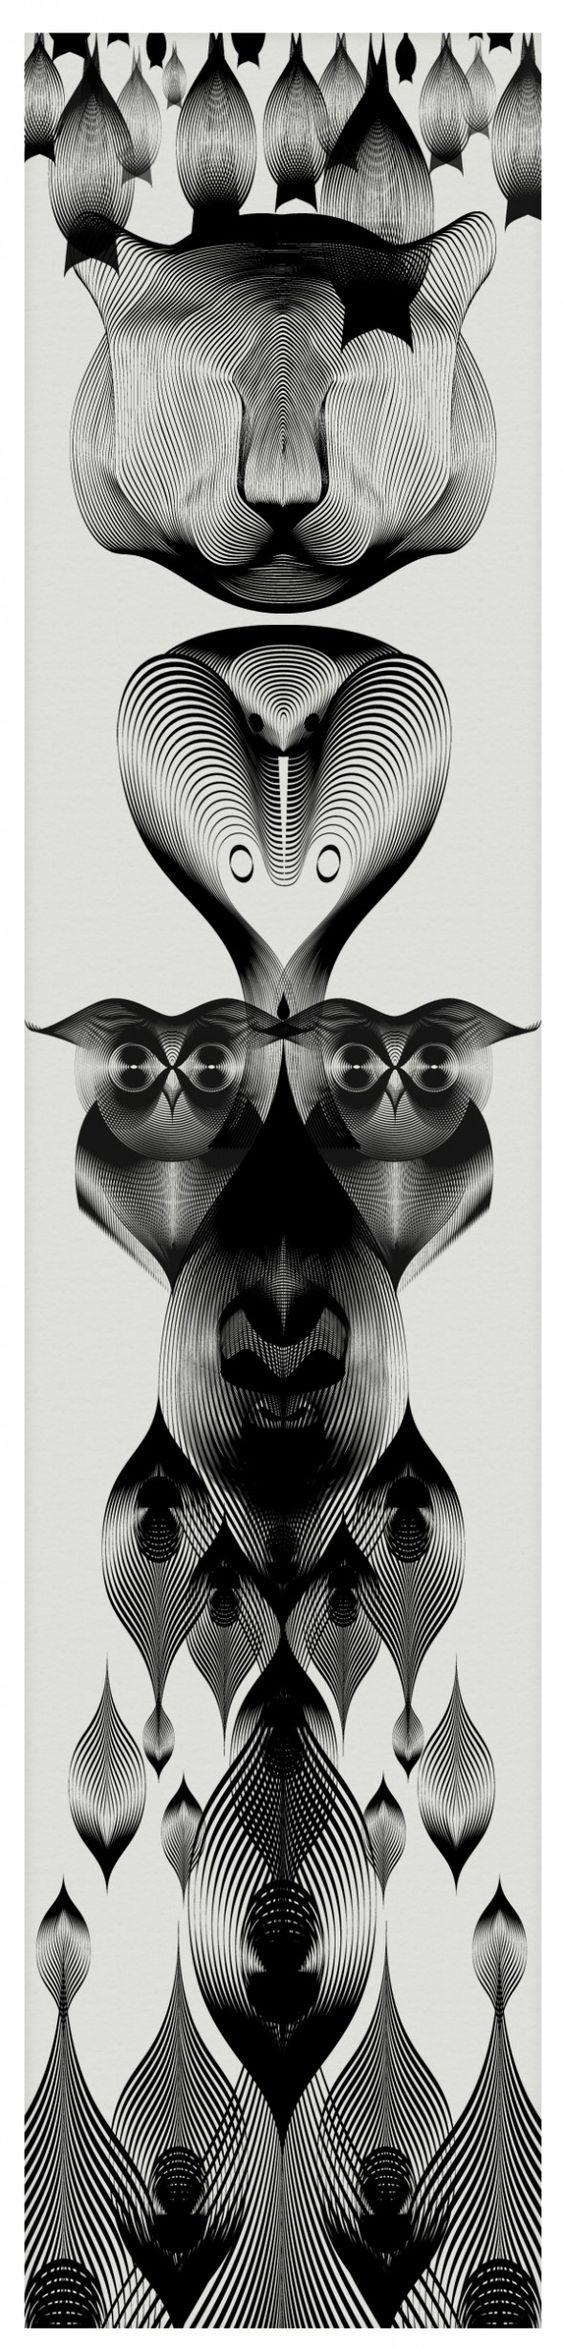 Animals in Moiré / Andrea Minini | AA13 – blog – Inspiration – Design – Architecture – Photographie – Art